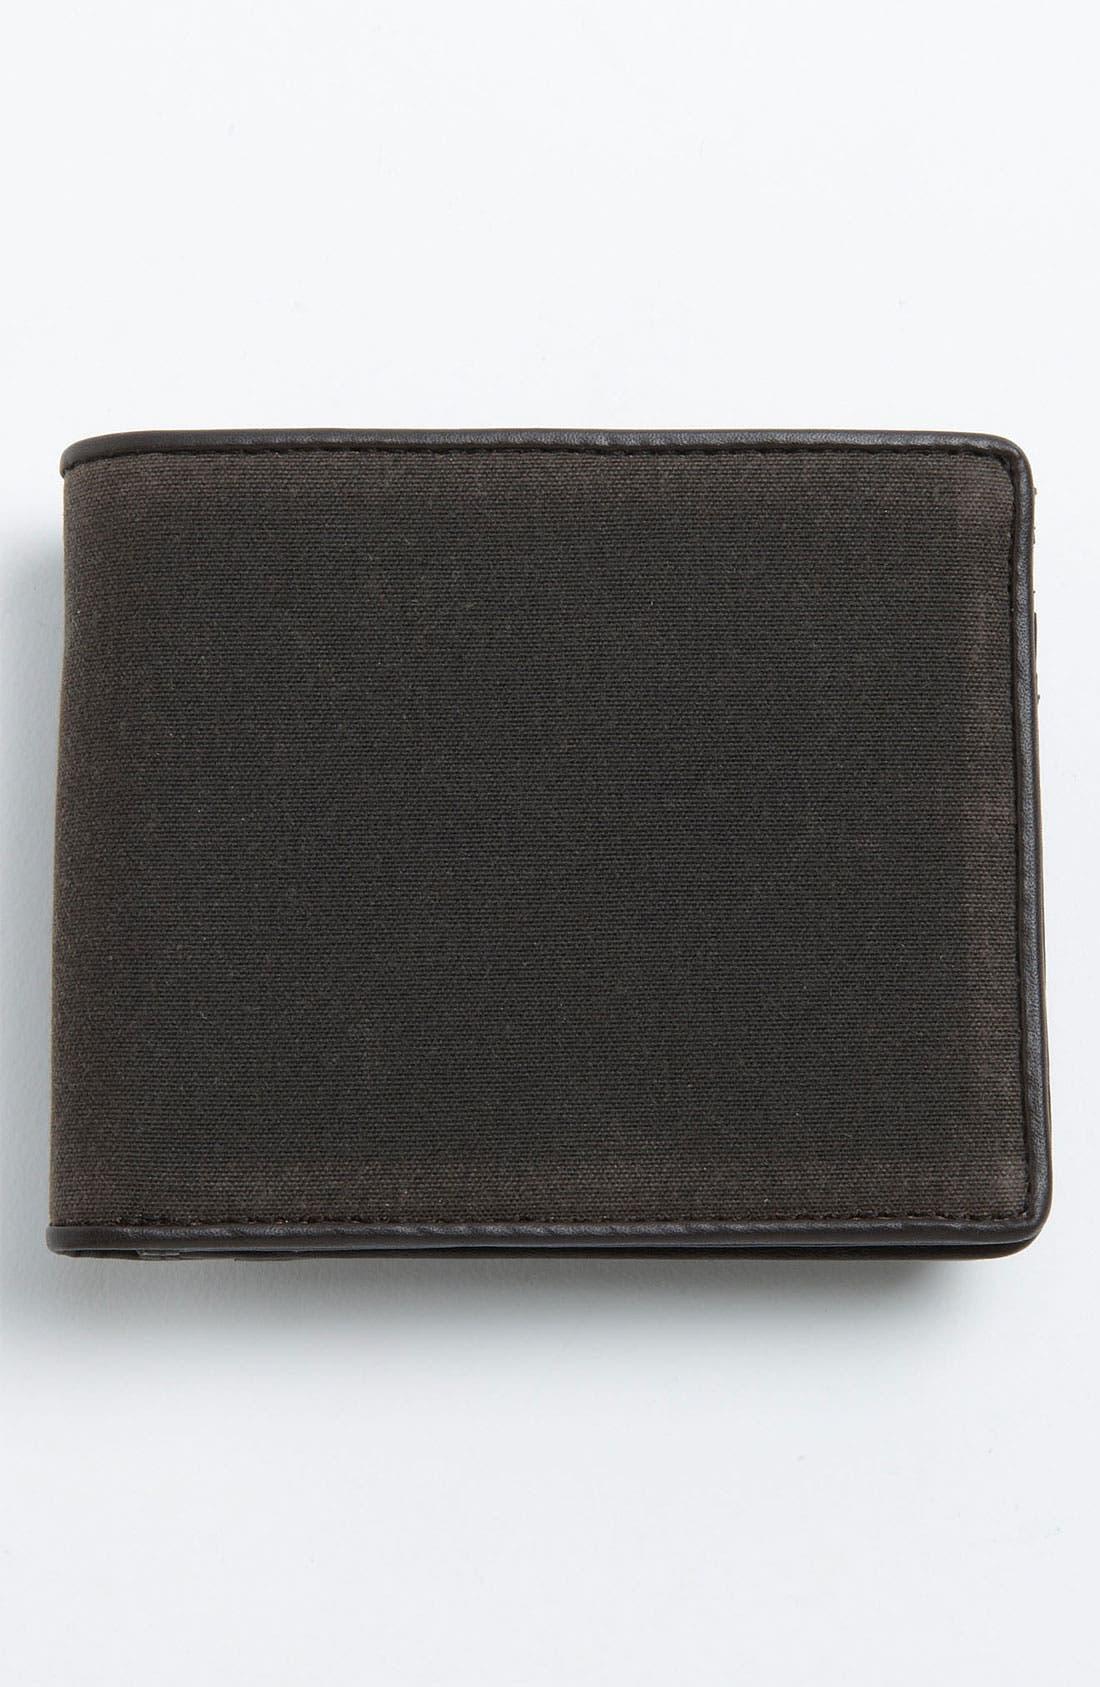 Alternate Image 2  - Jack Spade 'Waxwear' Wallet